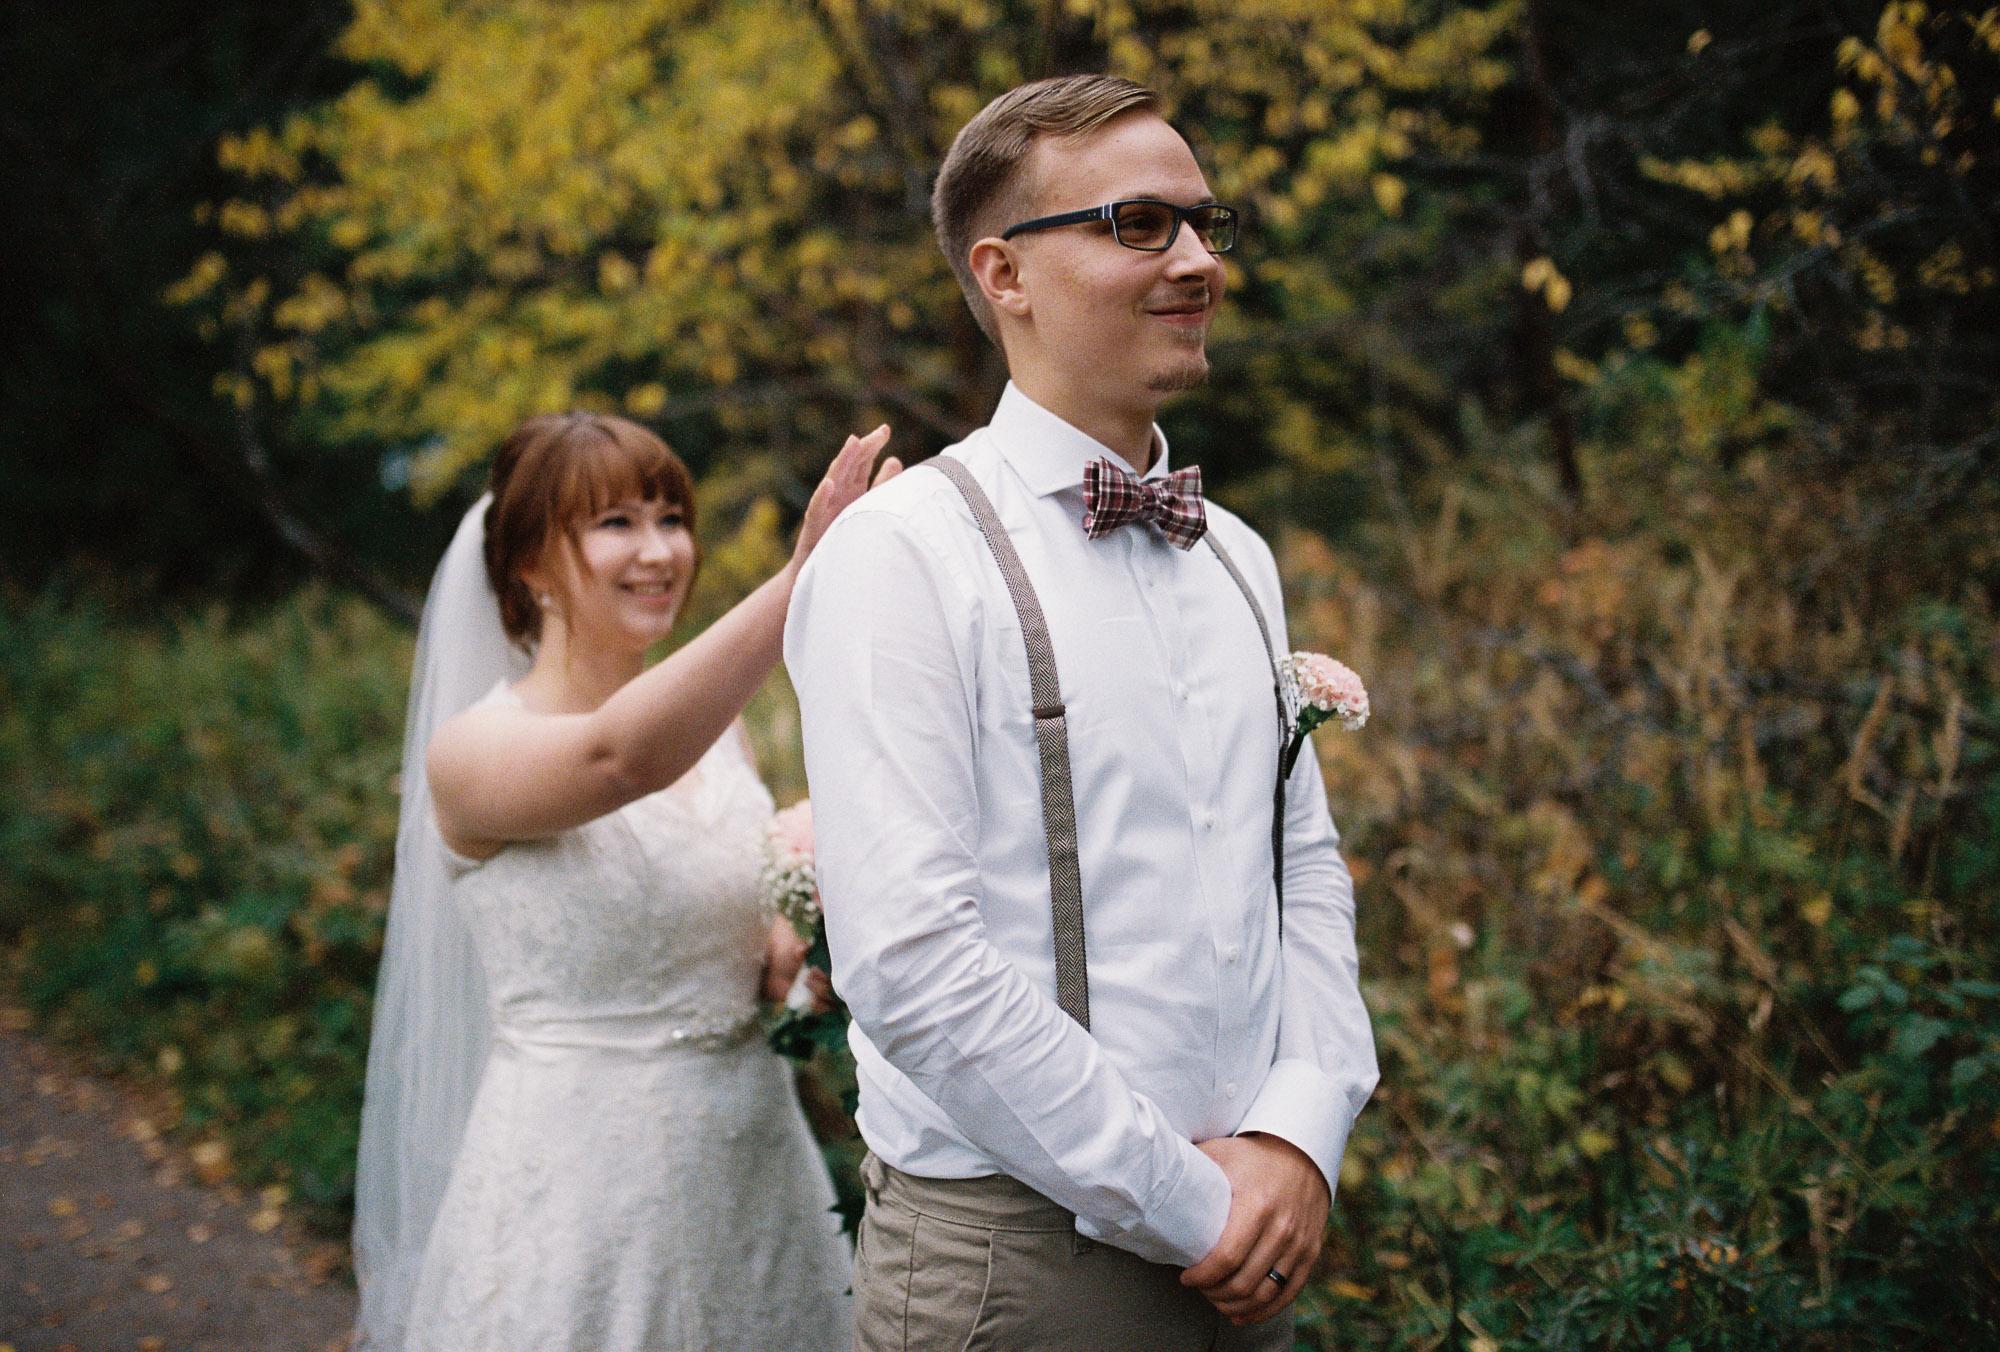 jere-satamo-analog-film-wedding-photographer-finland-066.jpg